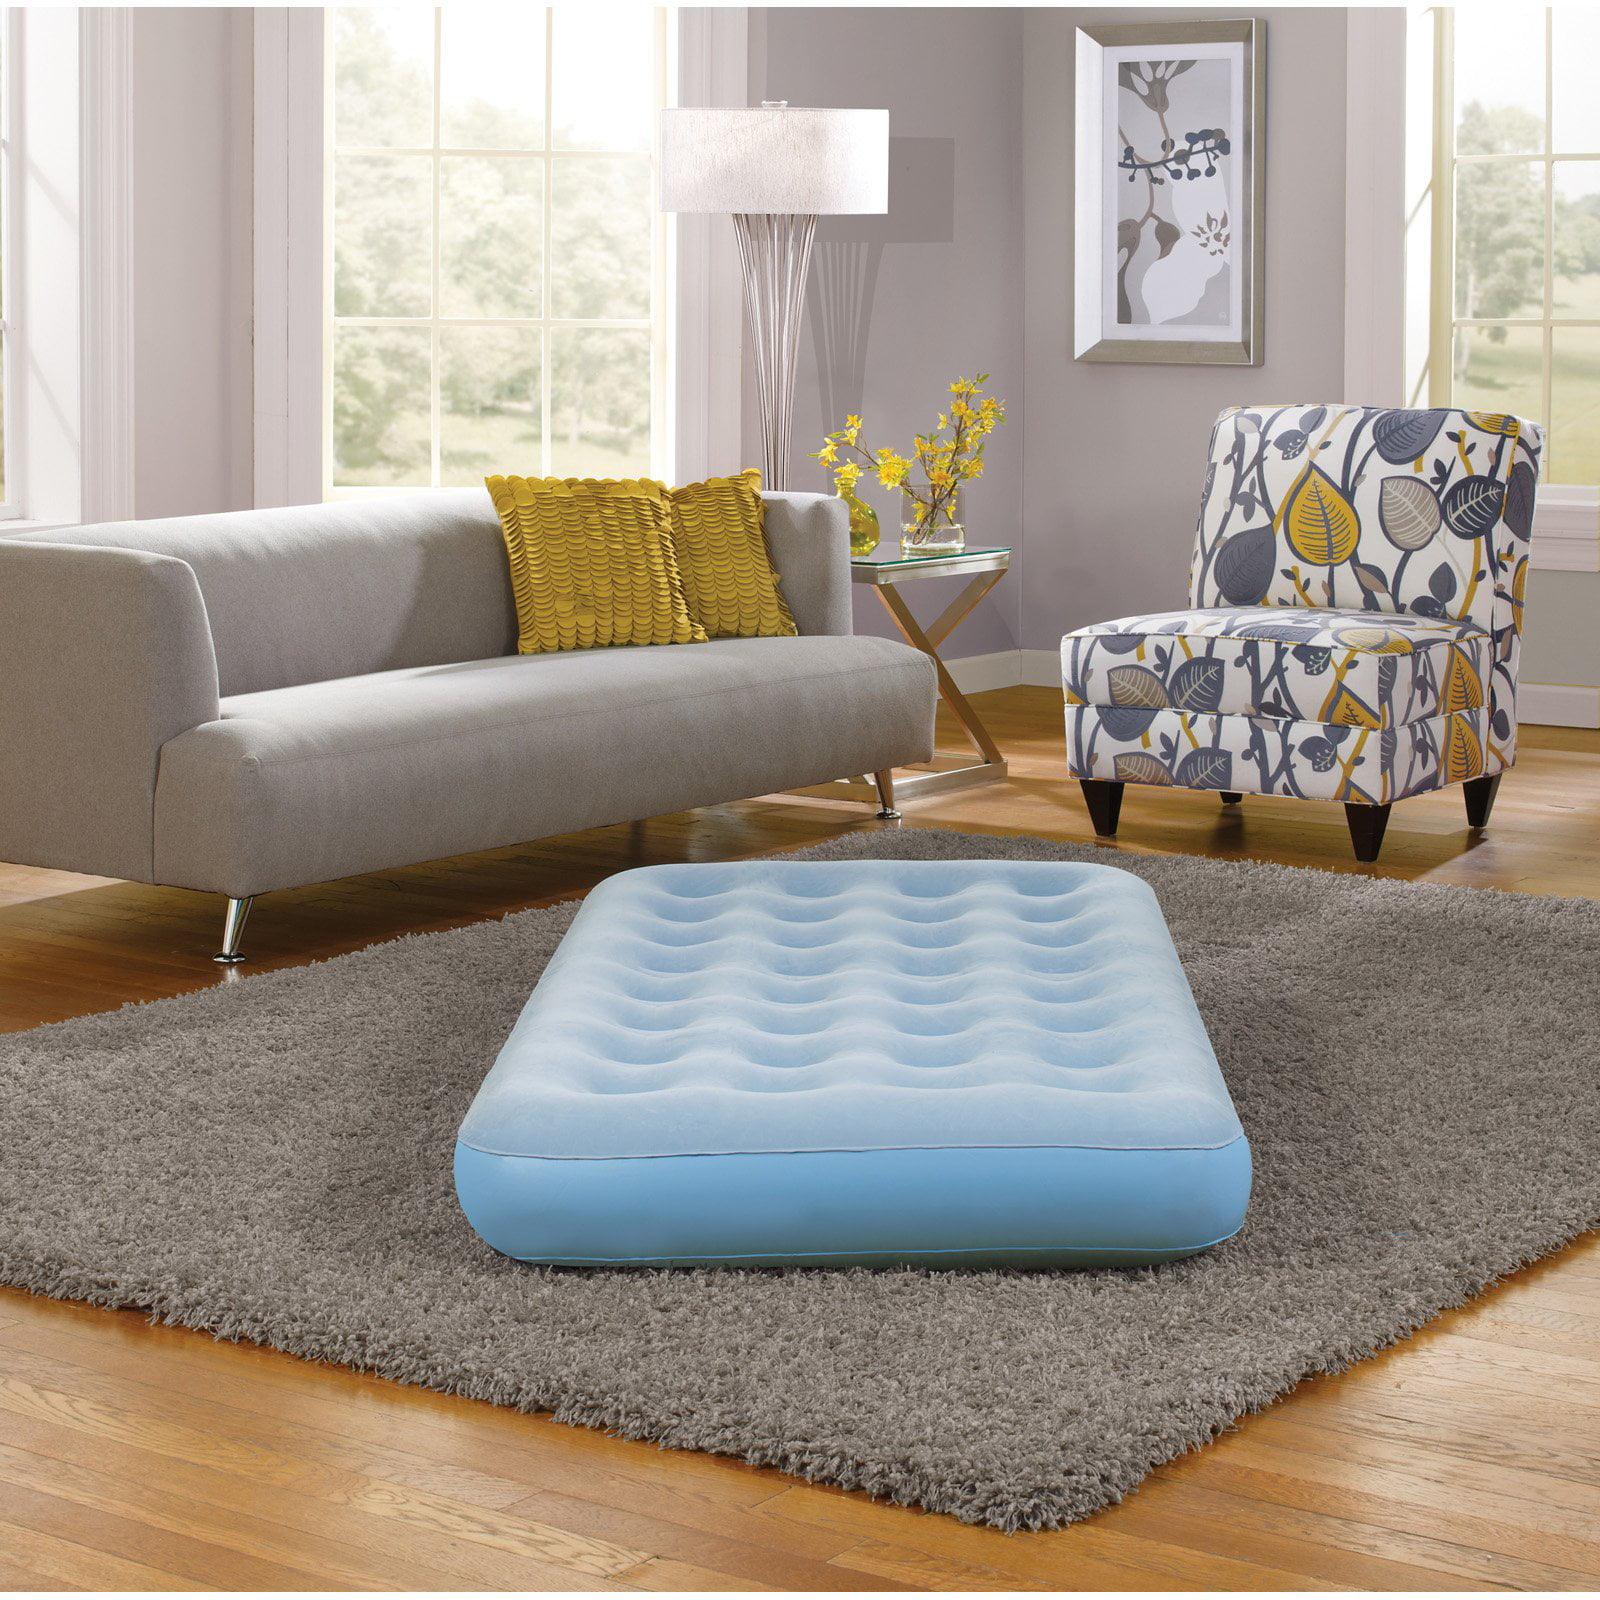 Simmons BeautySleep Smart Aire 9 inch Air Bed Mattress by